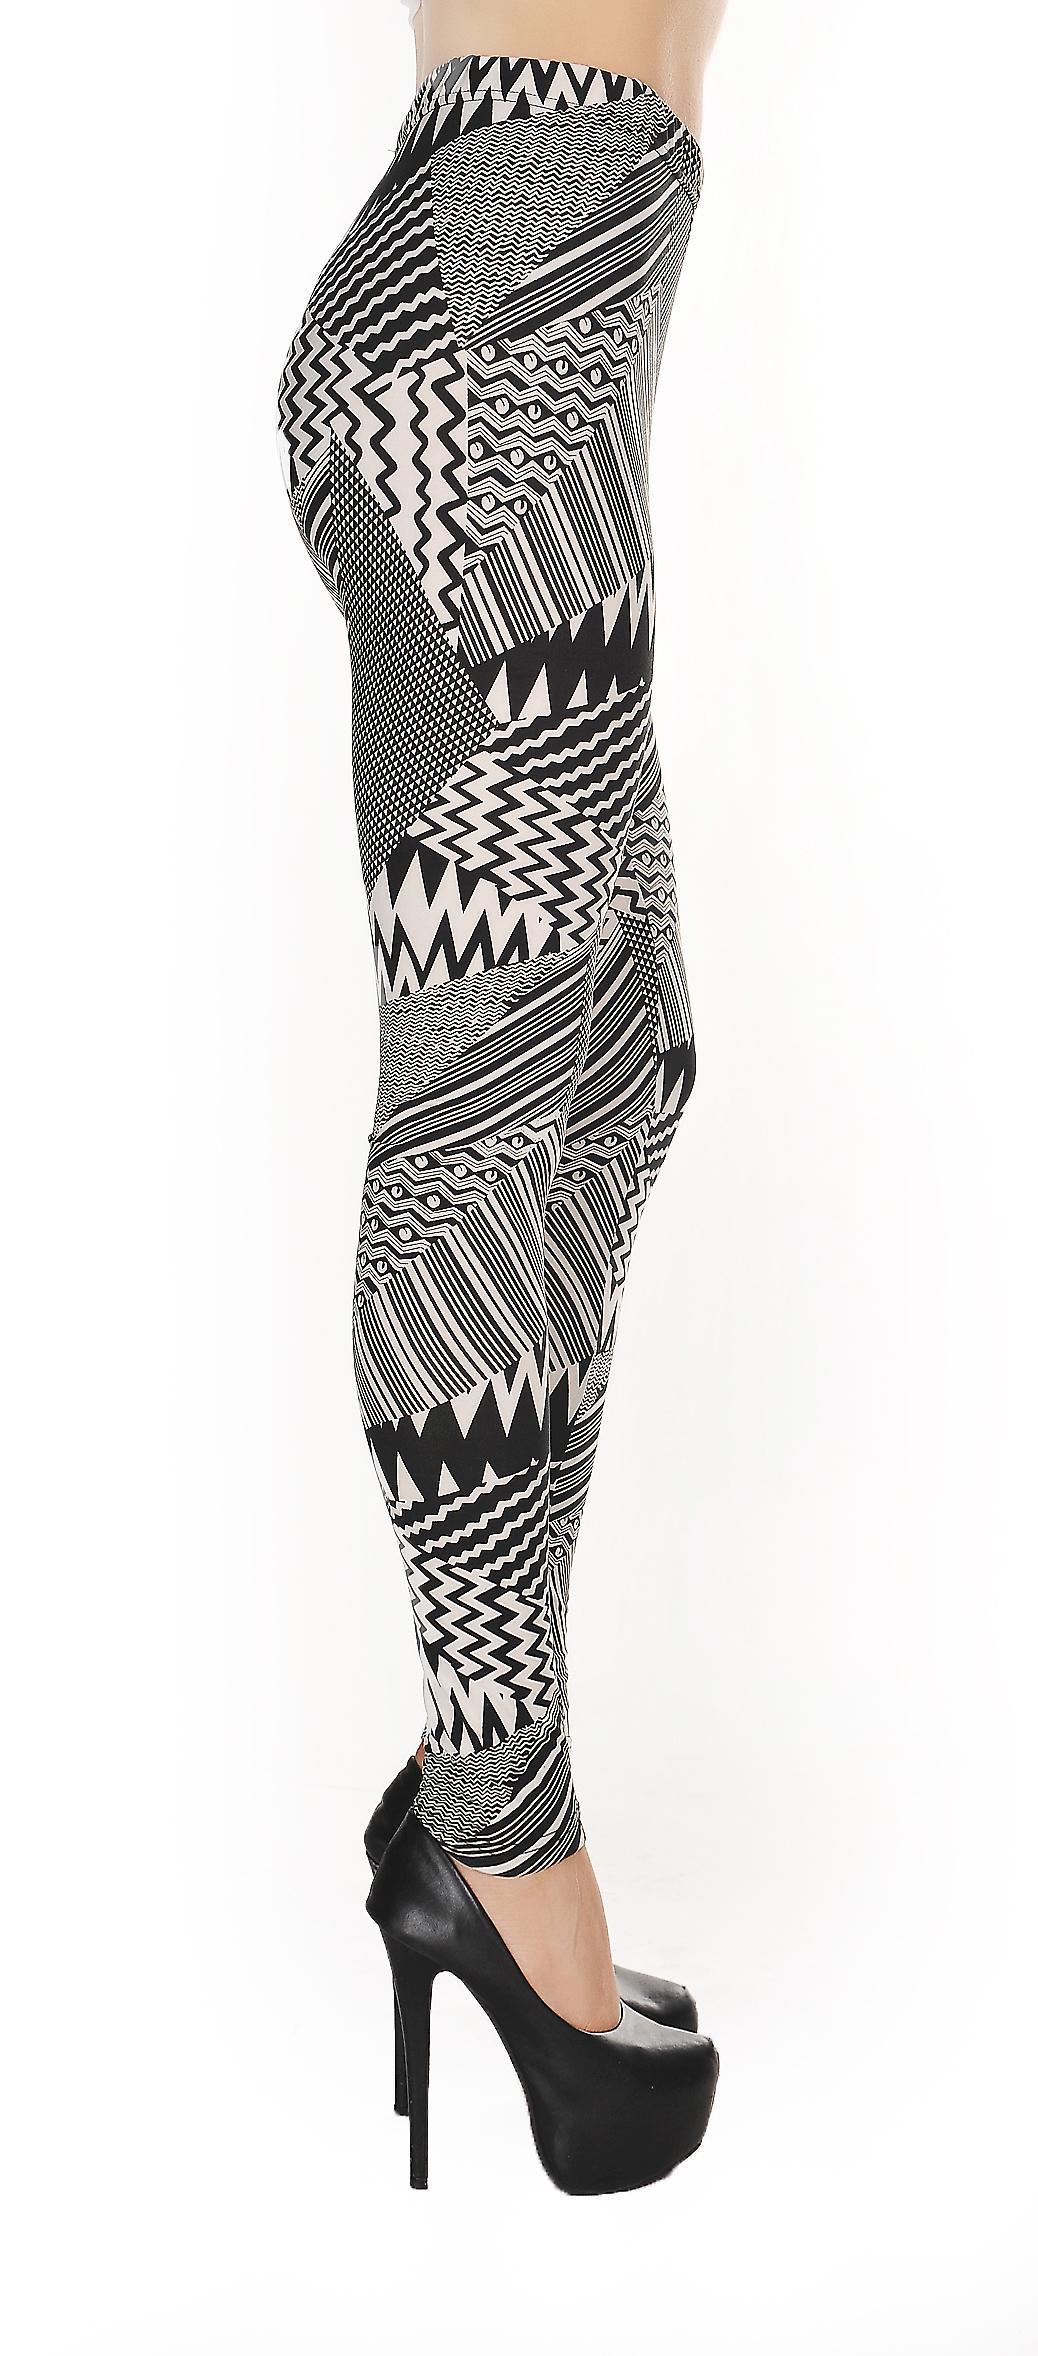 Waooh - Mode - Legging gestreept patroon psychedelic